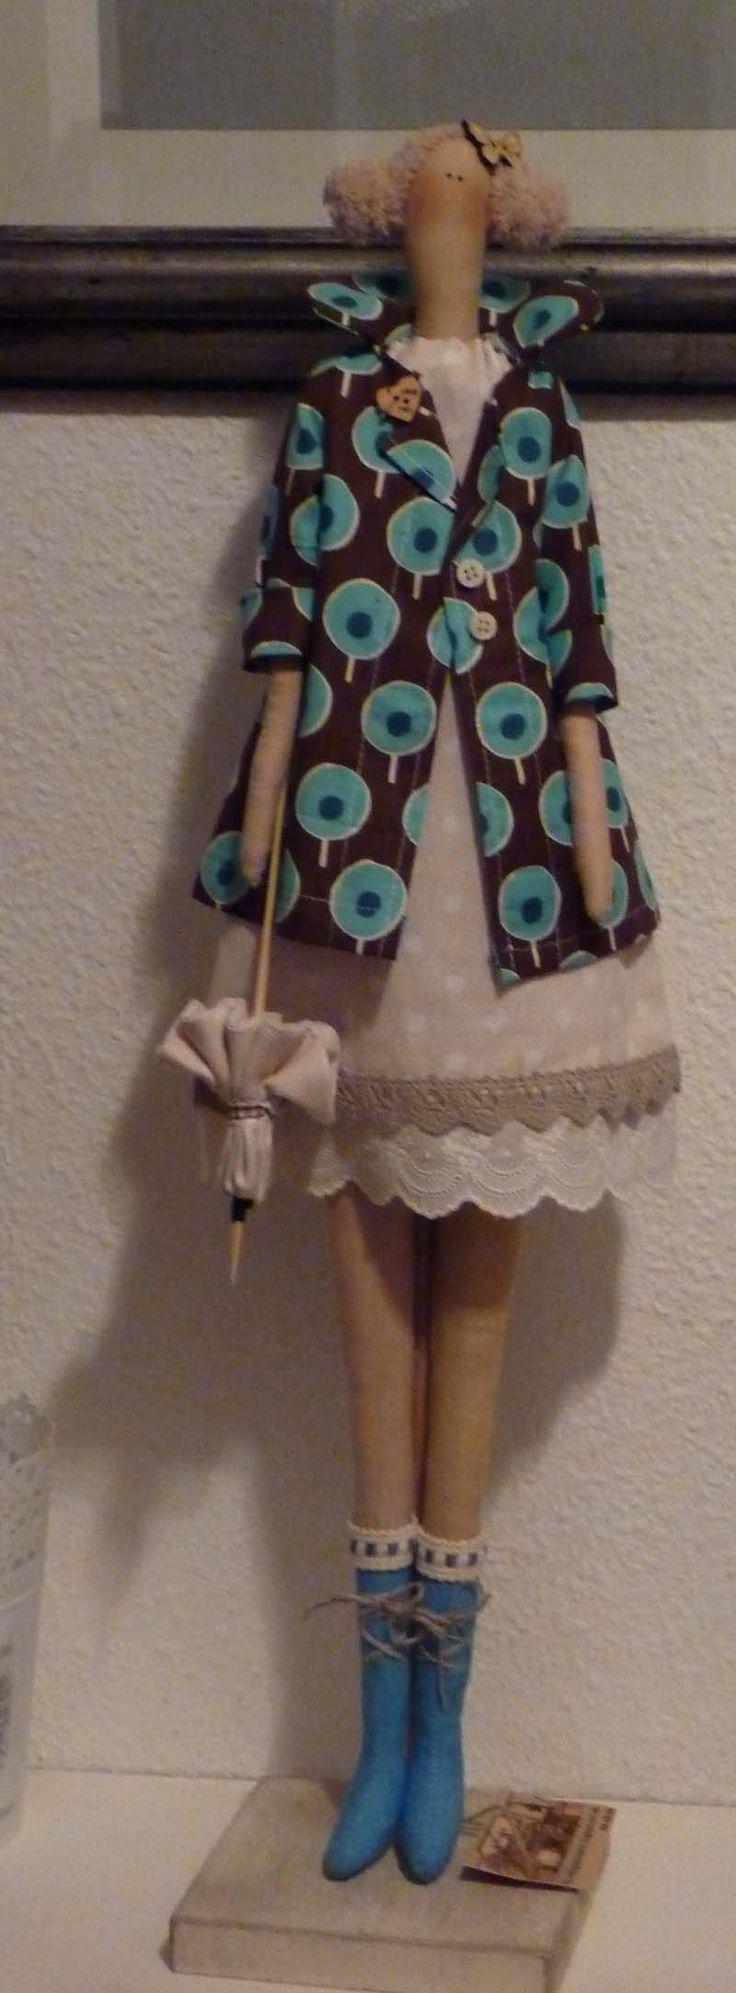 74 best Tildas images on Pinterest | Fabric dolls, Rag dolls and Boy ...